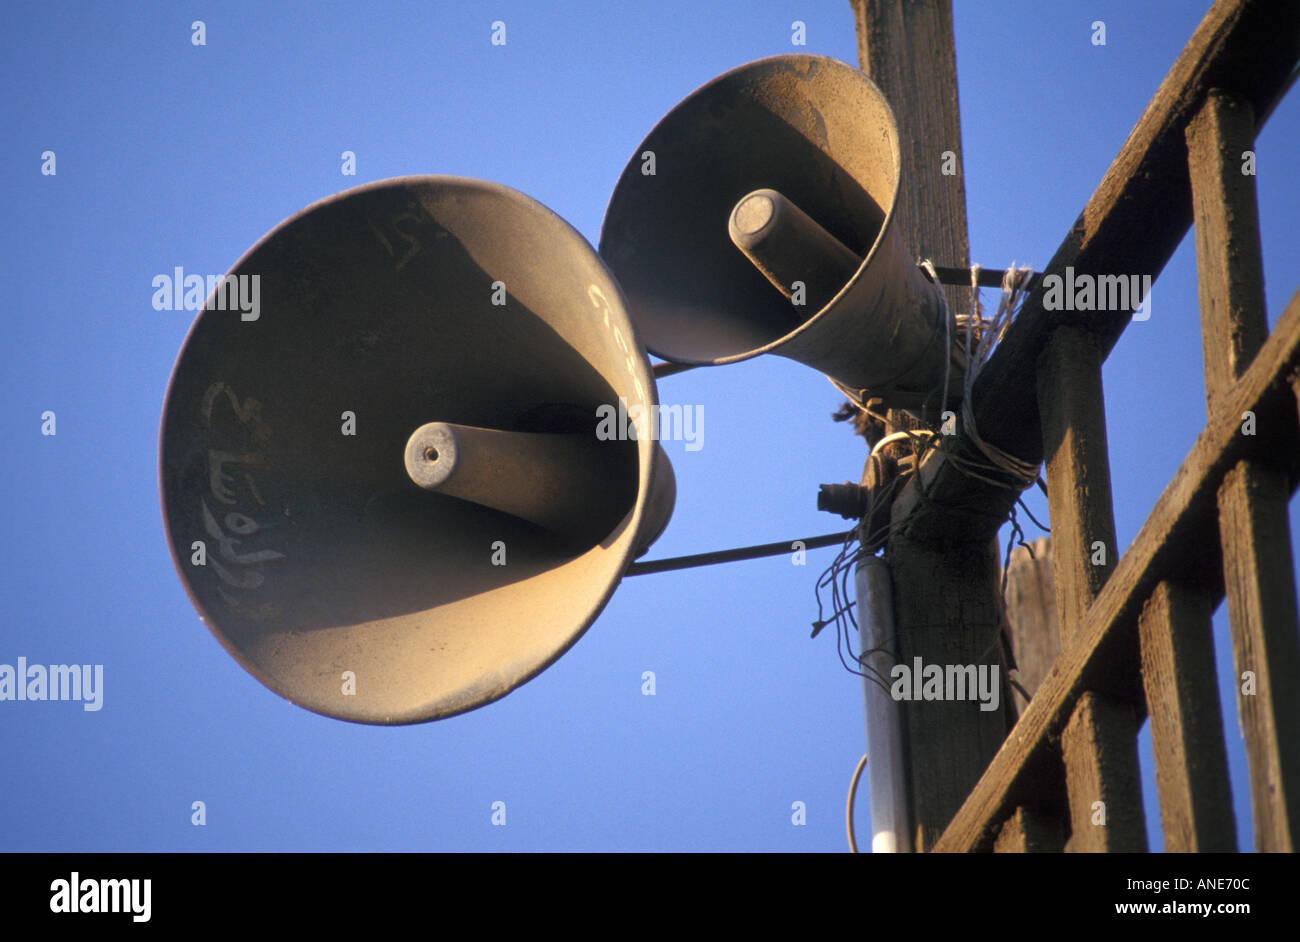 Mosque Loudspeakers in Islamic Cairo (Egypt) - Stock Image